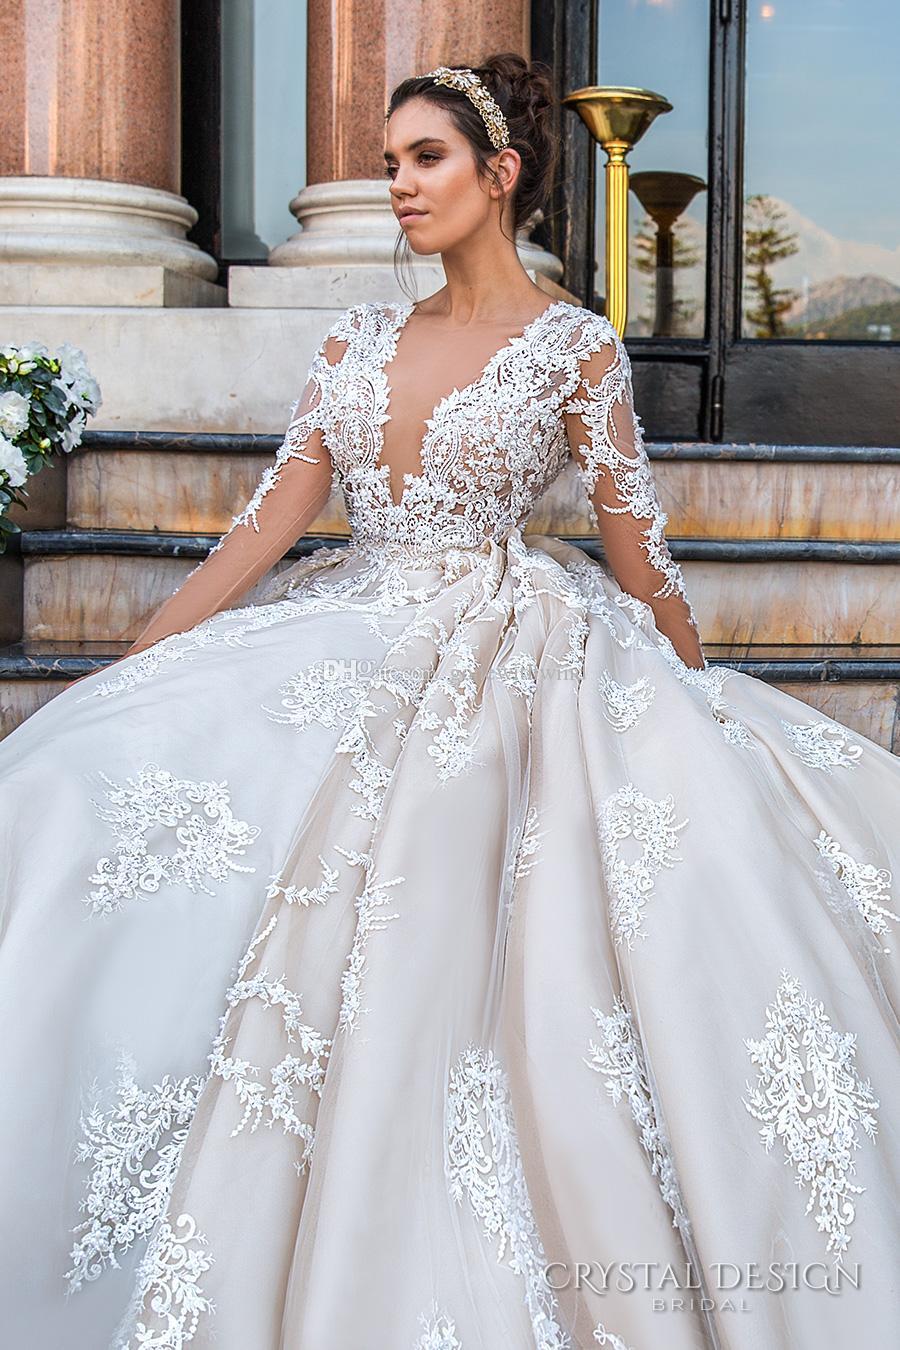 keyhole back monarch train princess wedding dresses 2017 crystal design bridal long sleeves plunging v neck sexy ball gown a line wedding